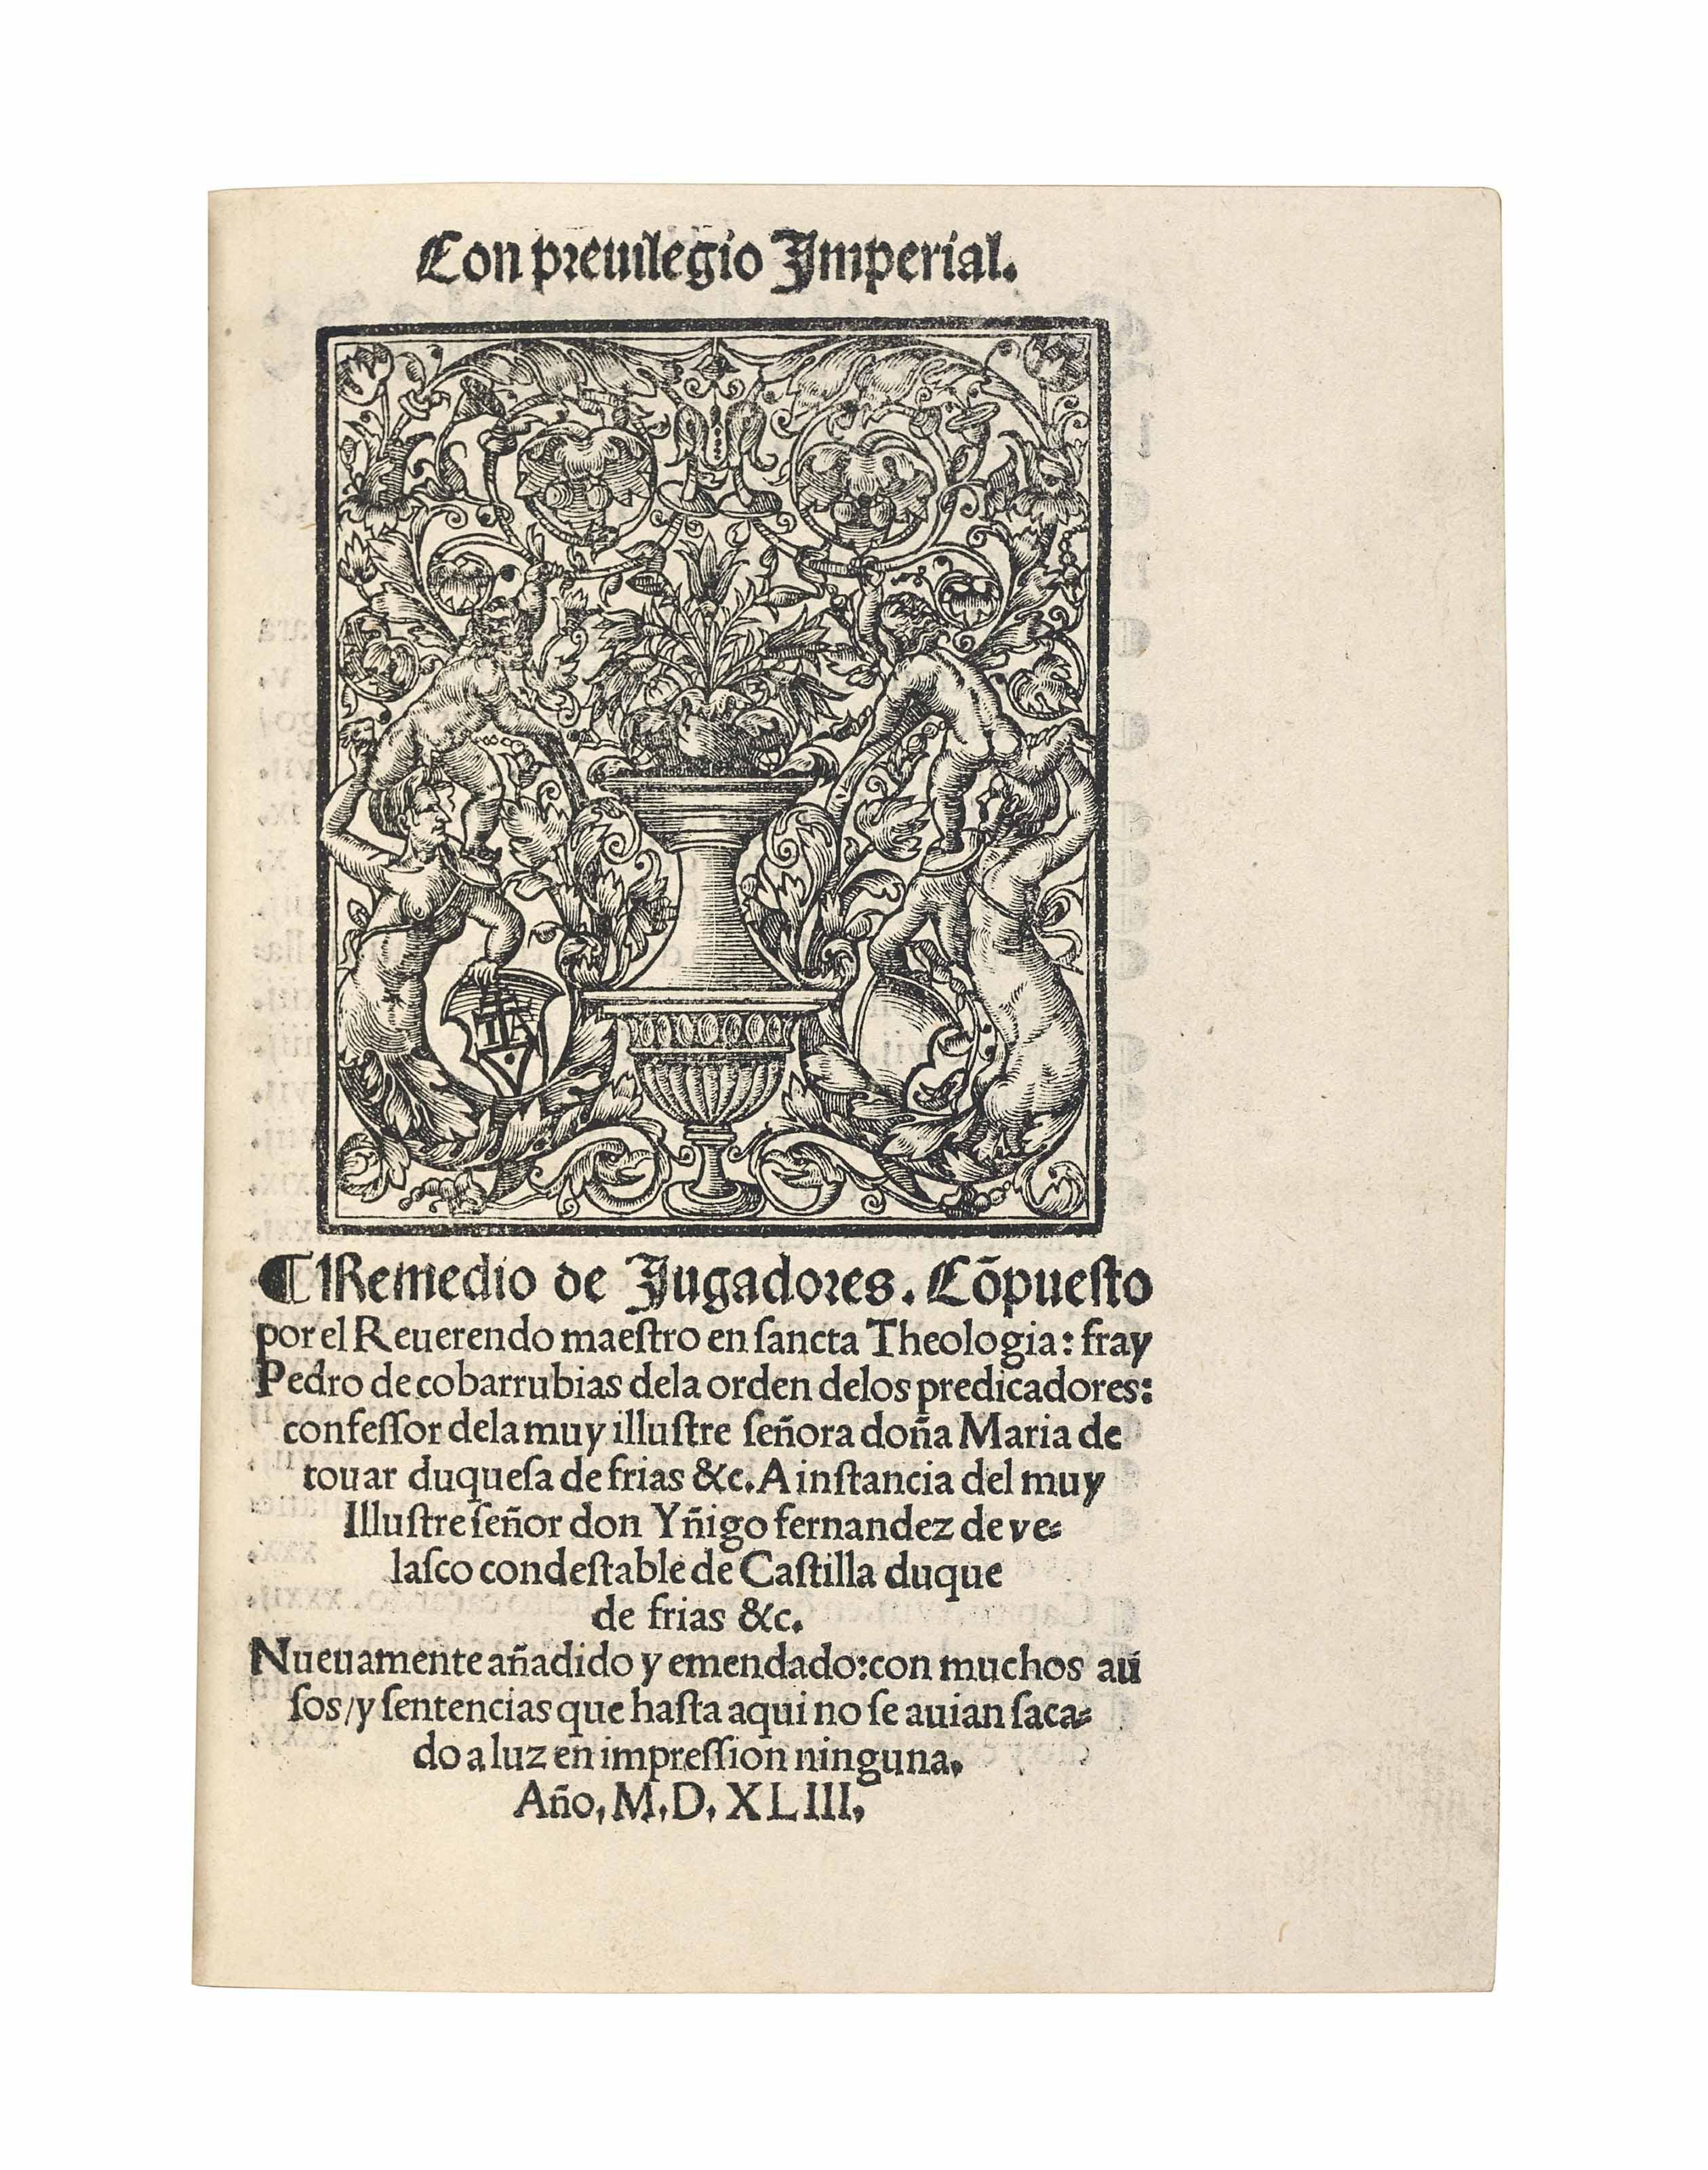 COVARRUBIAS, Pedro de (d.1530)